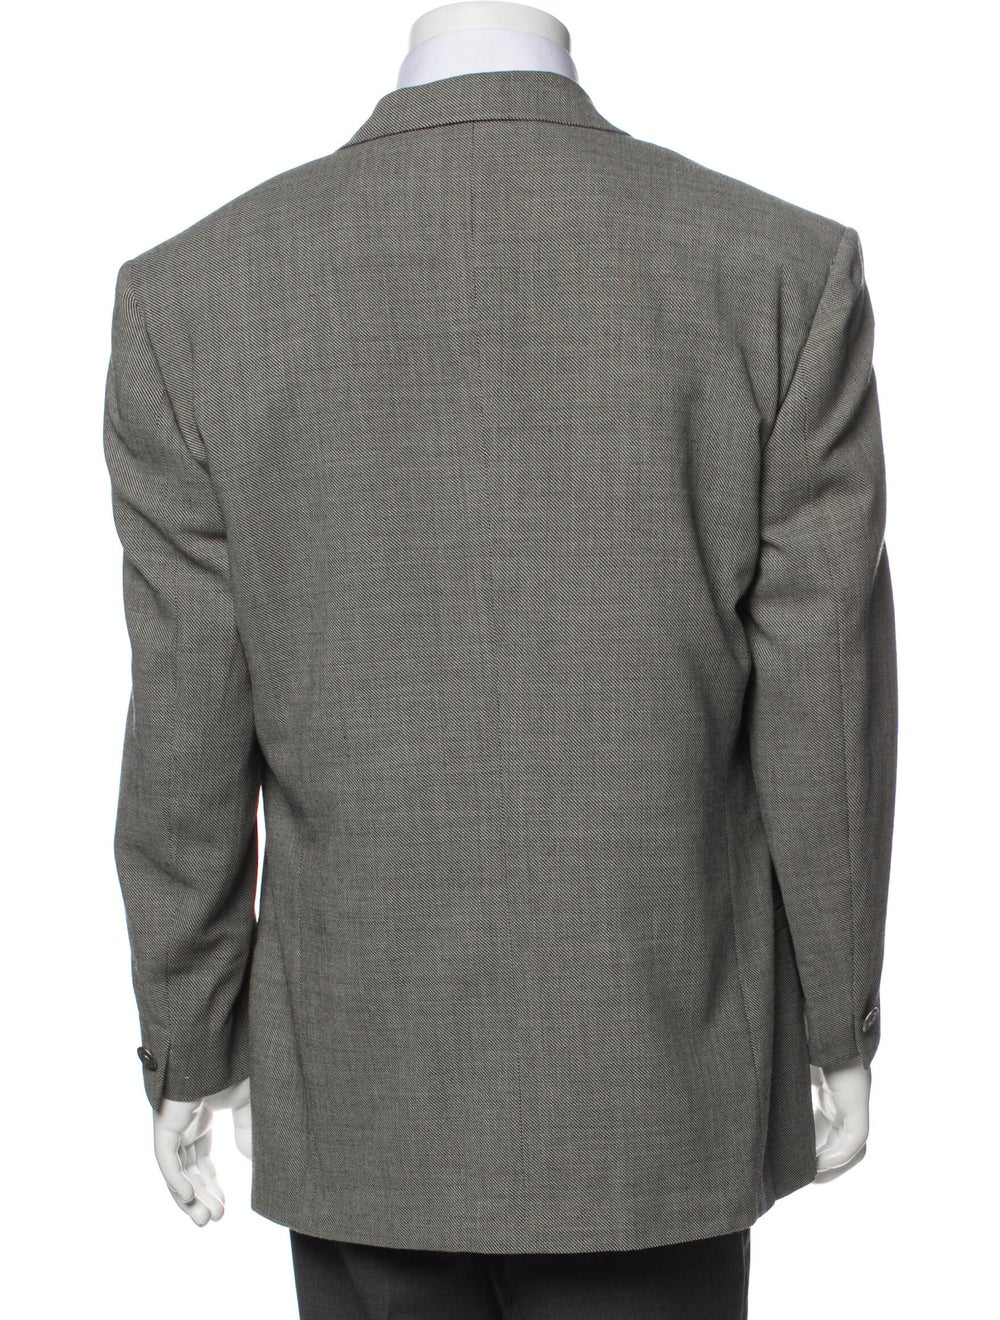 Gianni Versace Wool Two-Piece Blazer Wool - image 3